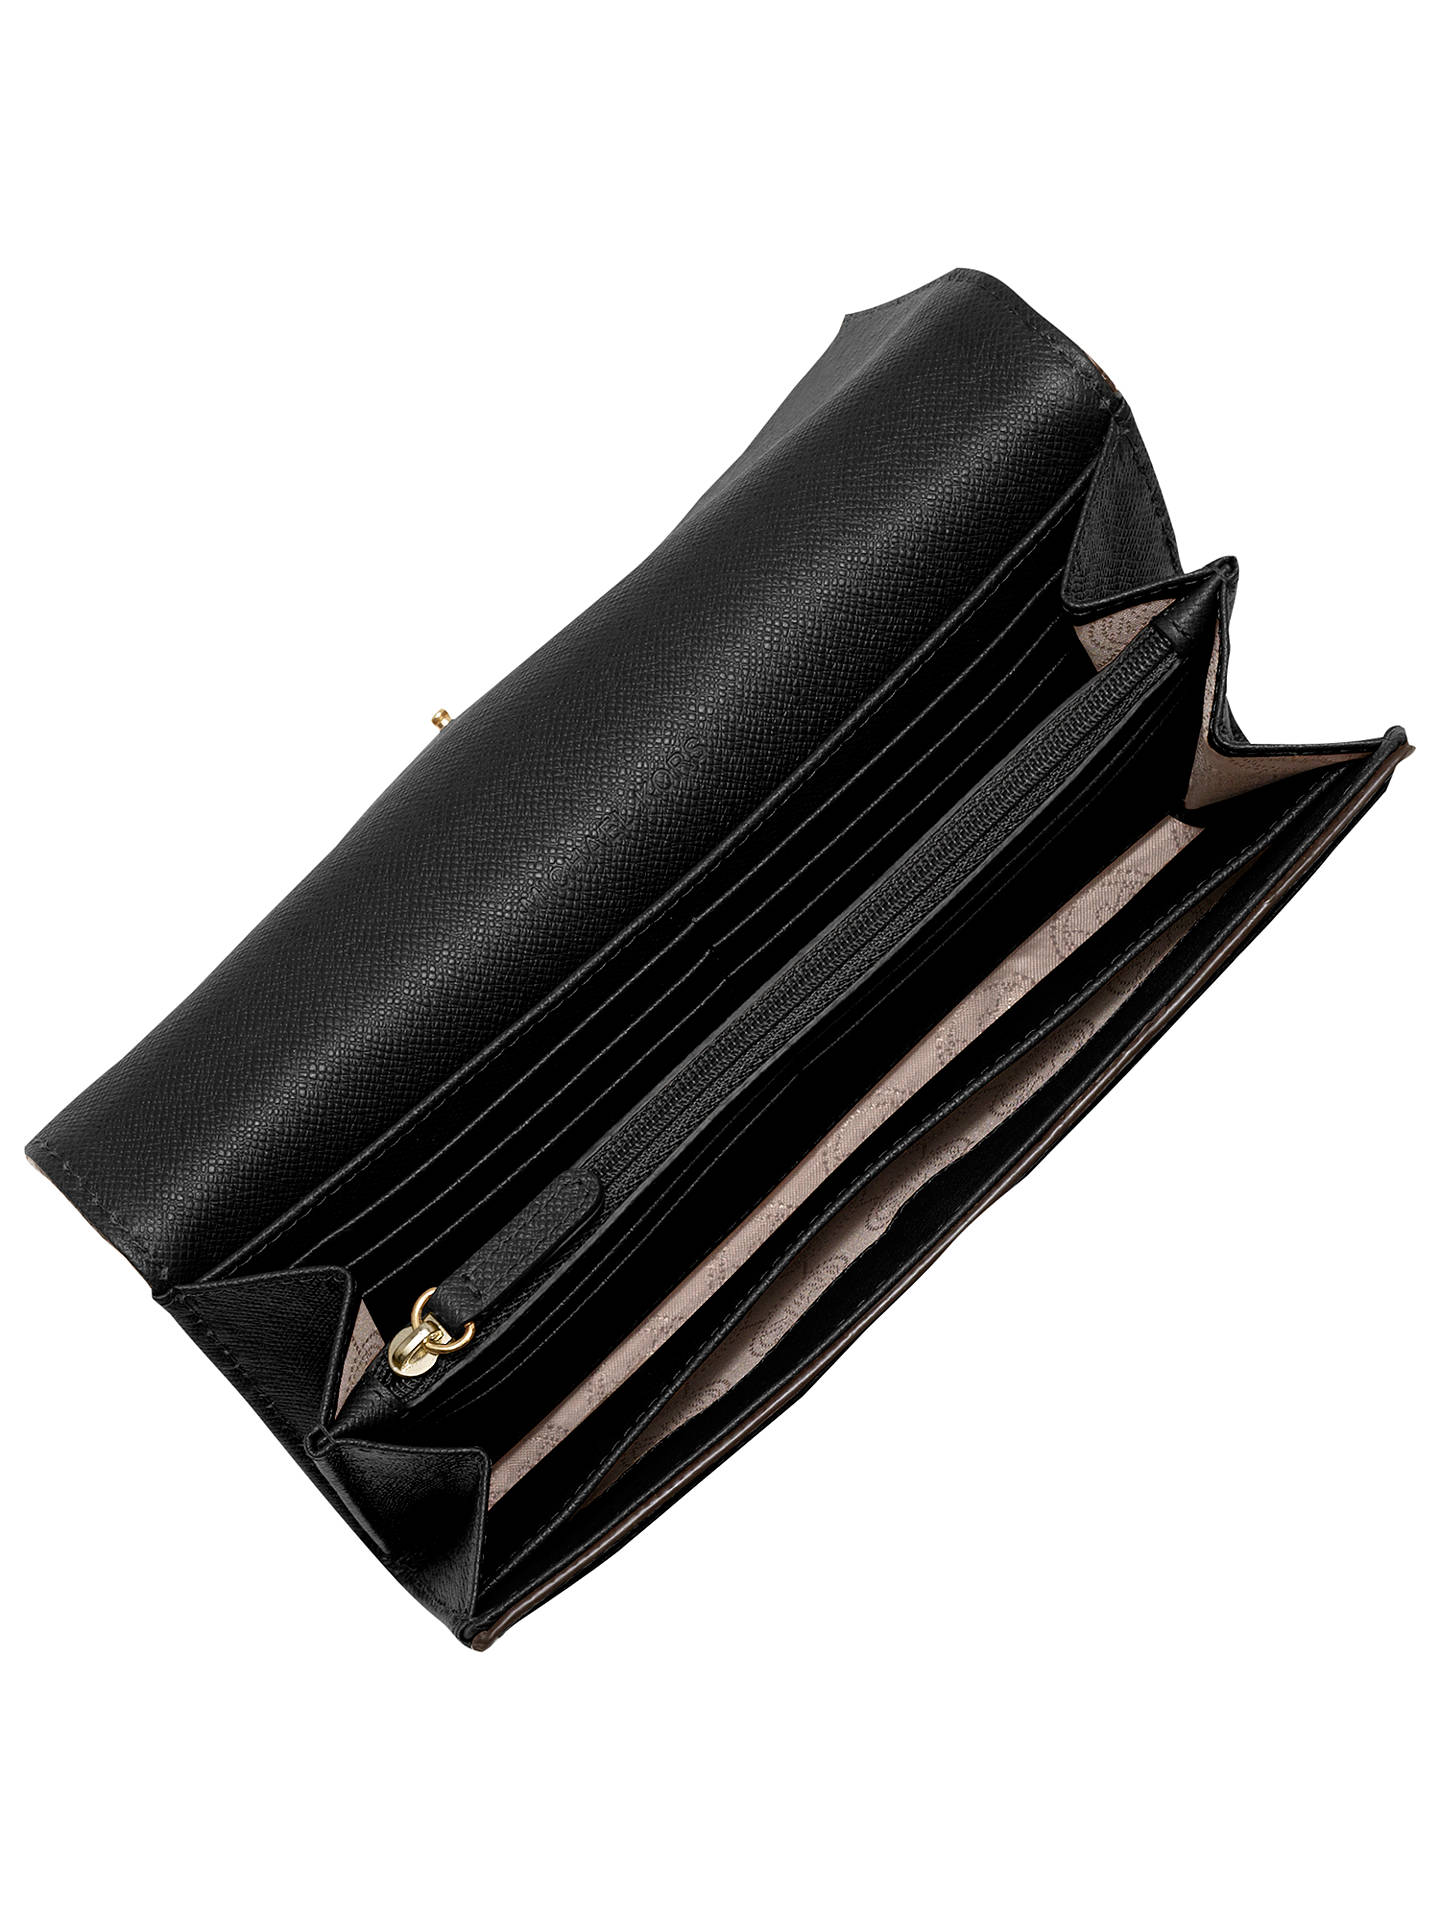 590623a8ef6b ... Buy MICHAEL Michael Kors Fulton Carryall Leather Purse, Black Online at  johnlewis.com